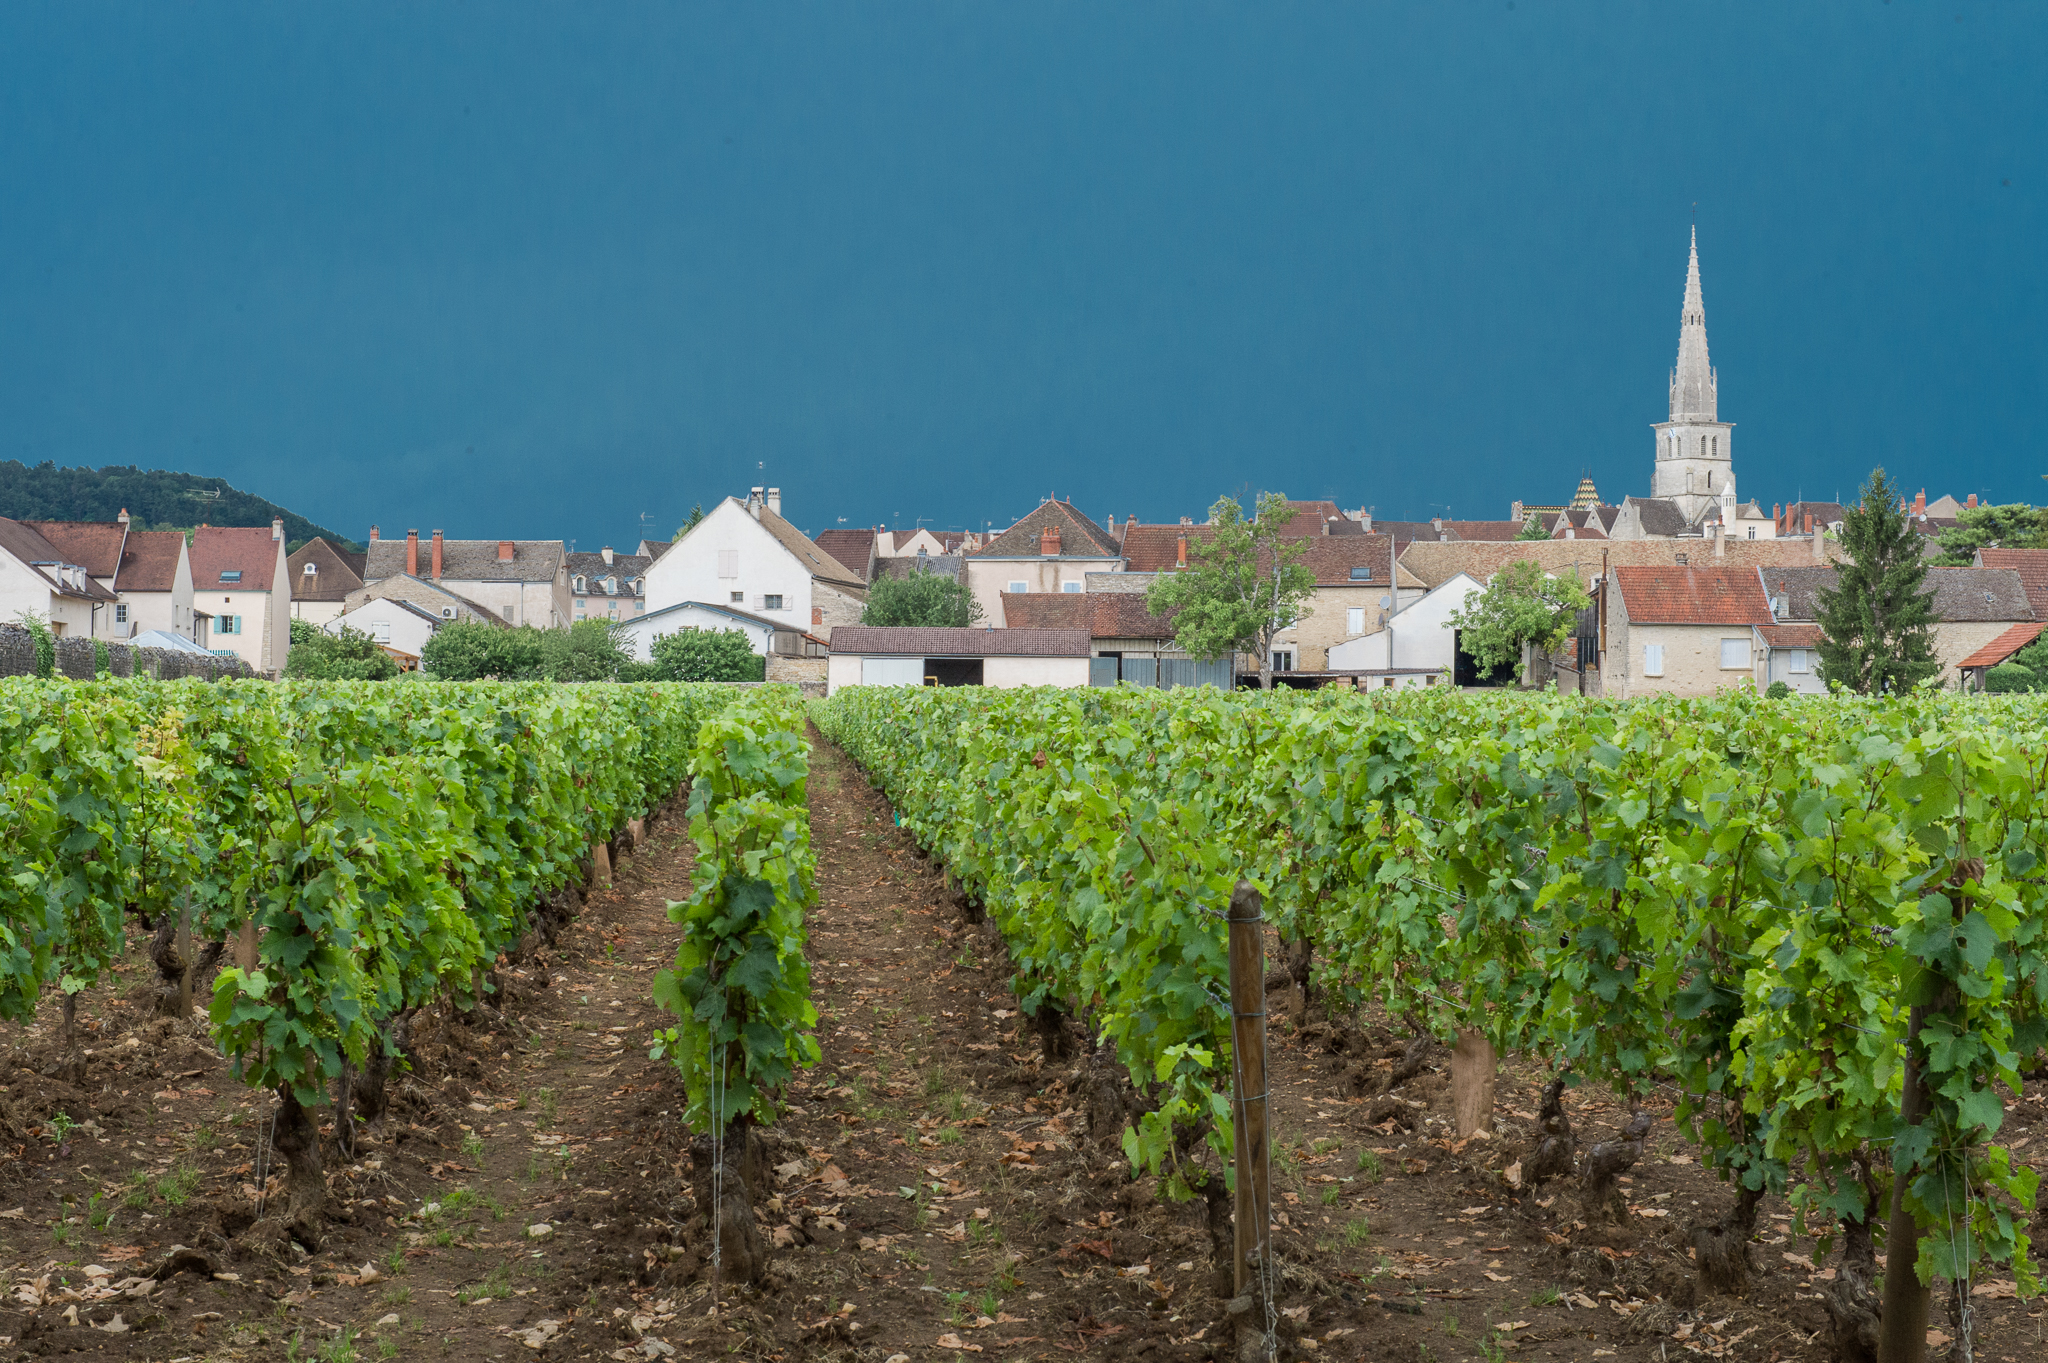 Jason-Davis-Images-Burgundy-0078.jpg